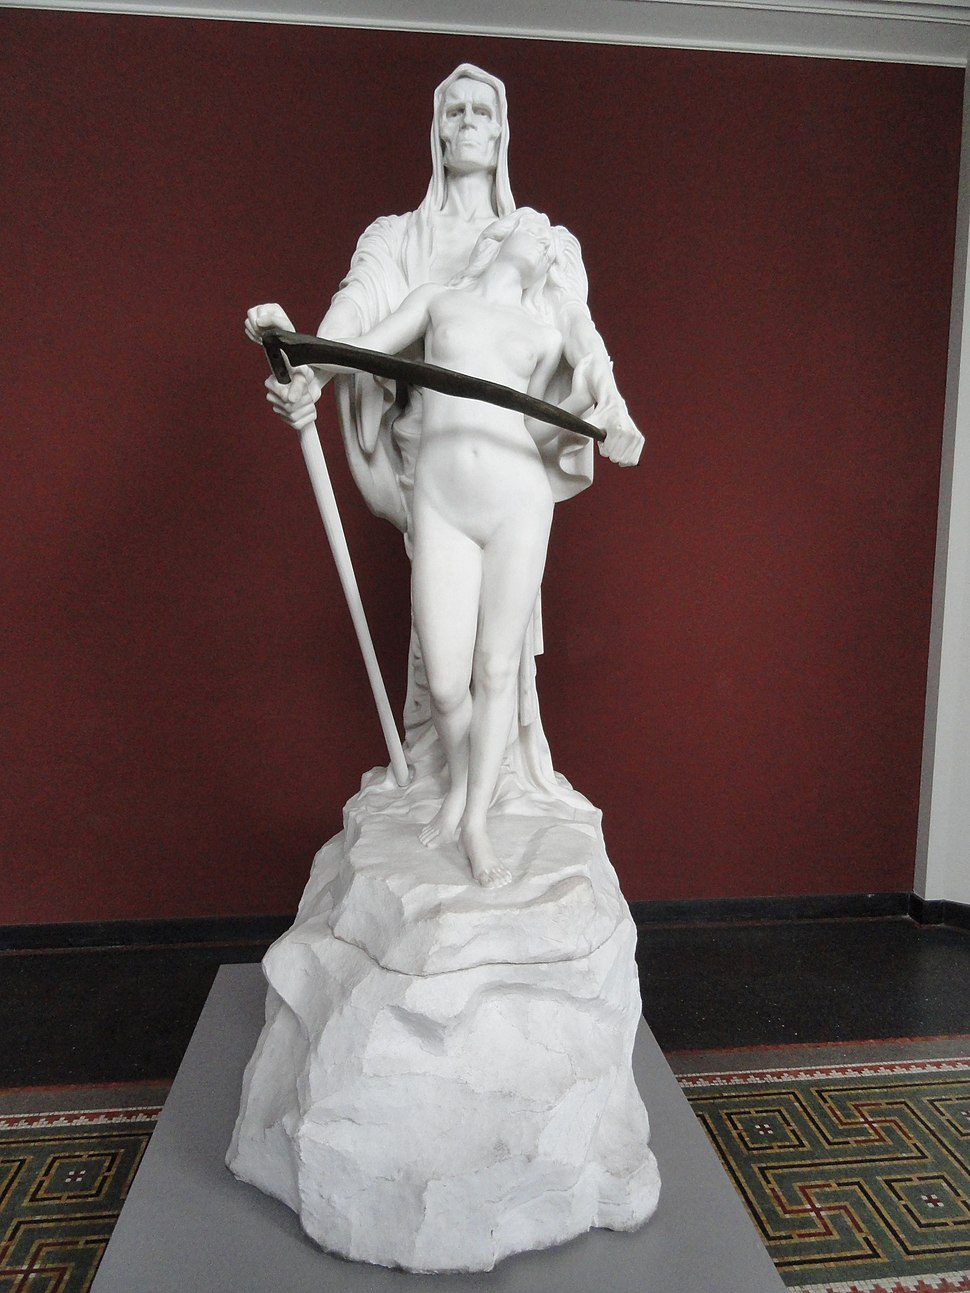 Death and the Maiden by Elna Borch, 1905 - Ny Carlsberg Glyptotek - Copenhagen - DSC09501